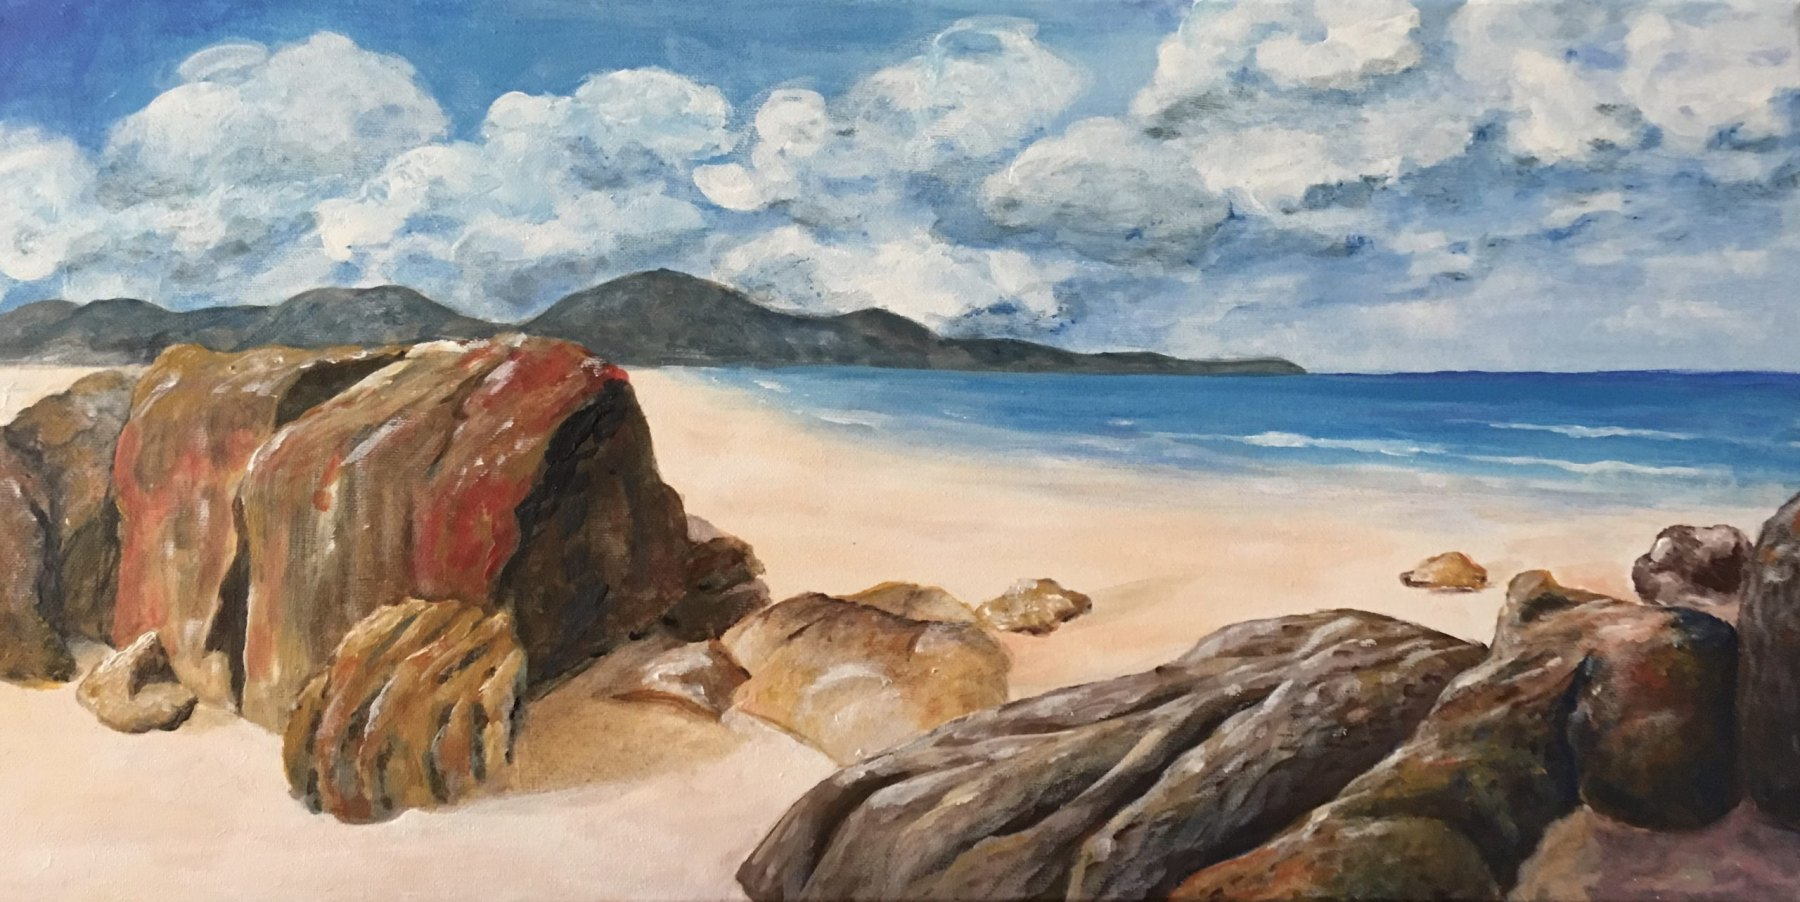 Squeaky Beach - Shirley Melissas